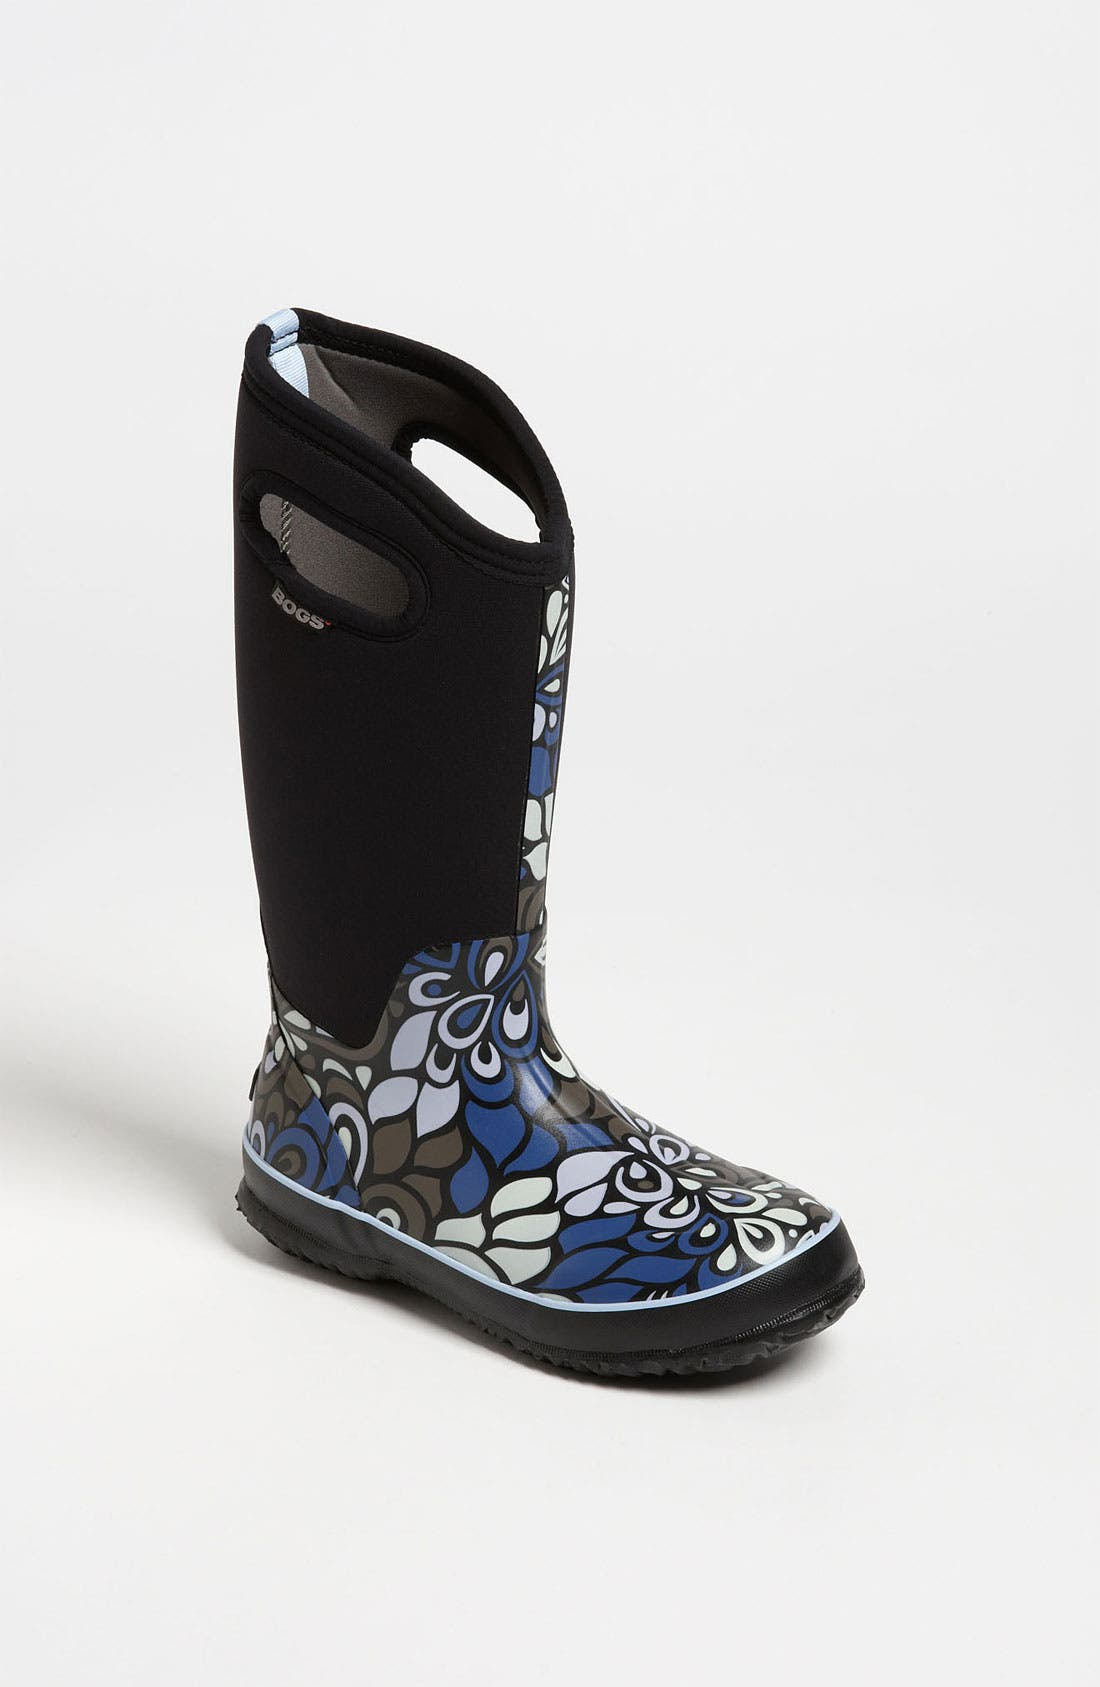 Main Image - Bogs 'Classic High Vintage' Rain Boot (Women)